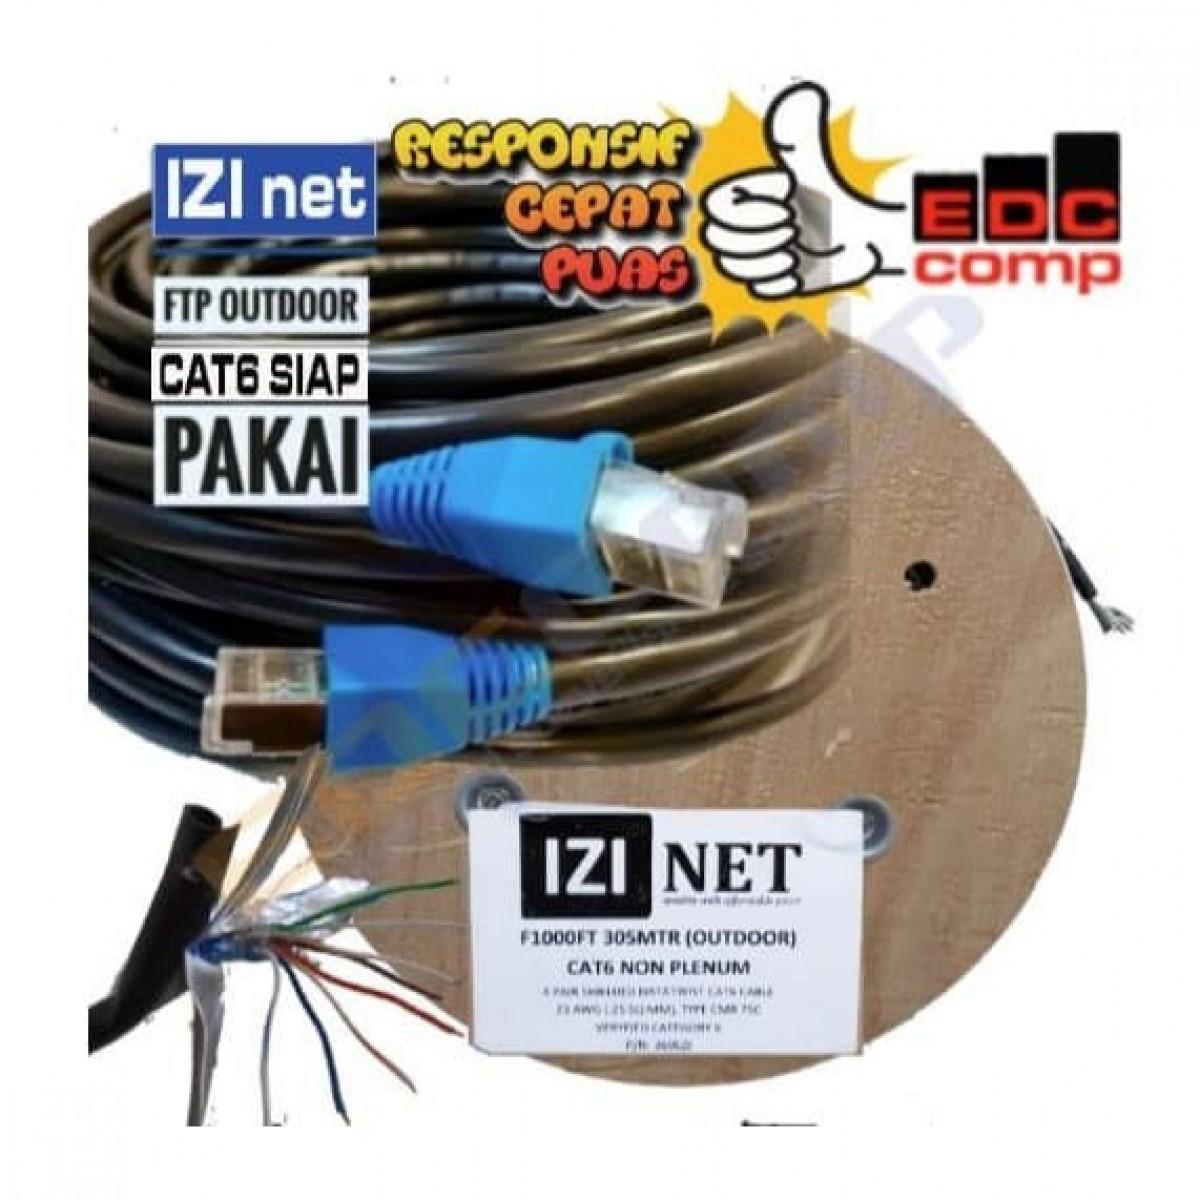 Cable STP/FTP Cat 5e Outdoor Cable 90 Meter IZI net Original - EdcComp